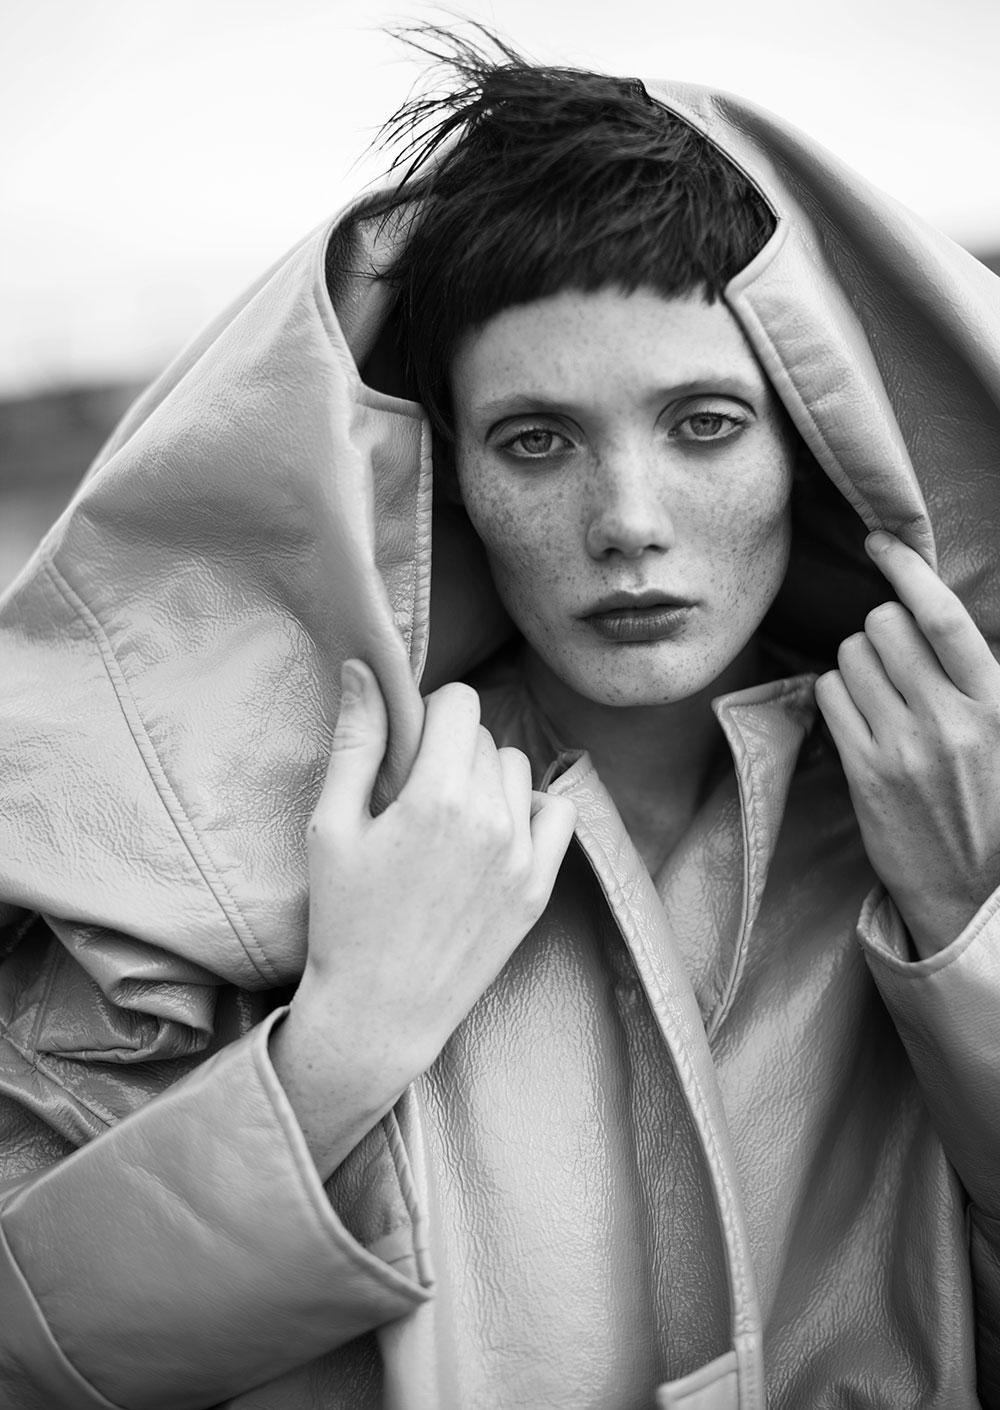 Black and white photo by Tatyana Nagayeva styled by Melissa Infante for MONROWE Magazine